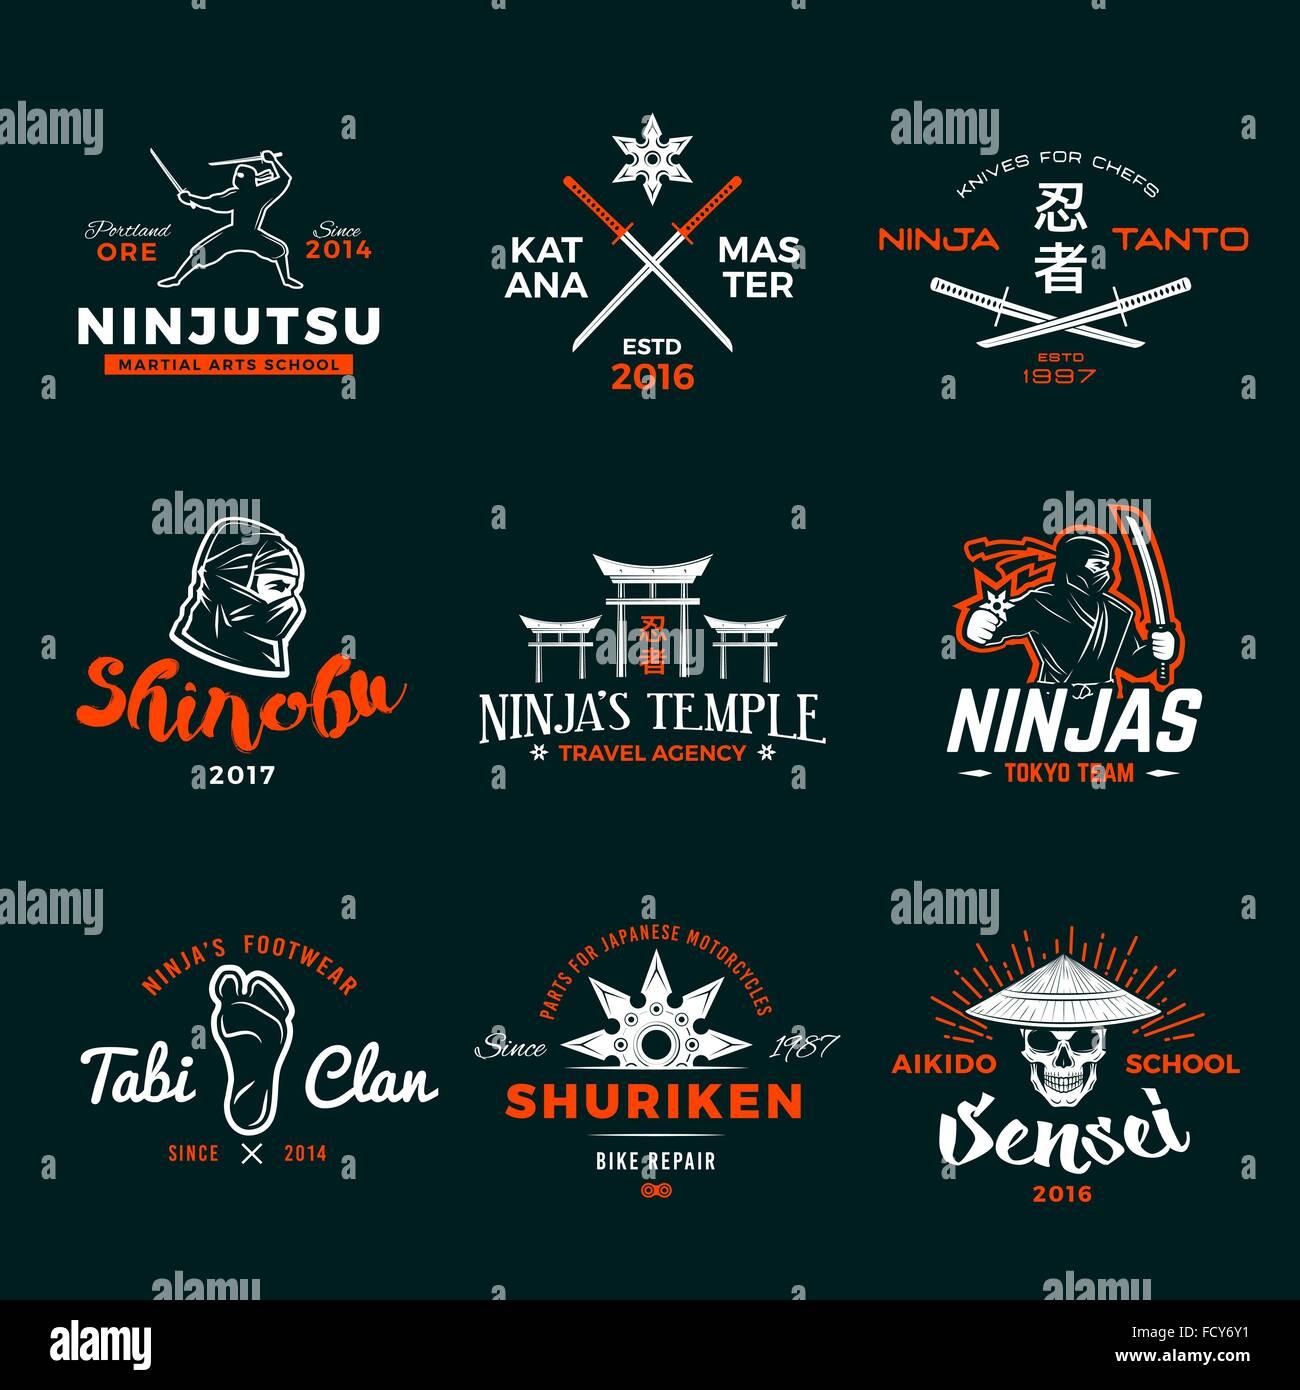 Design shirt japan -  Set Of Japan Ninja Logo Ninjato Sword Insignia Design Vintage Shuriken Badge Mixed